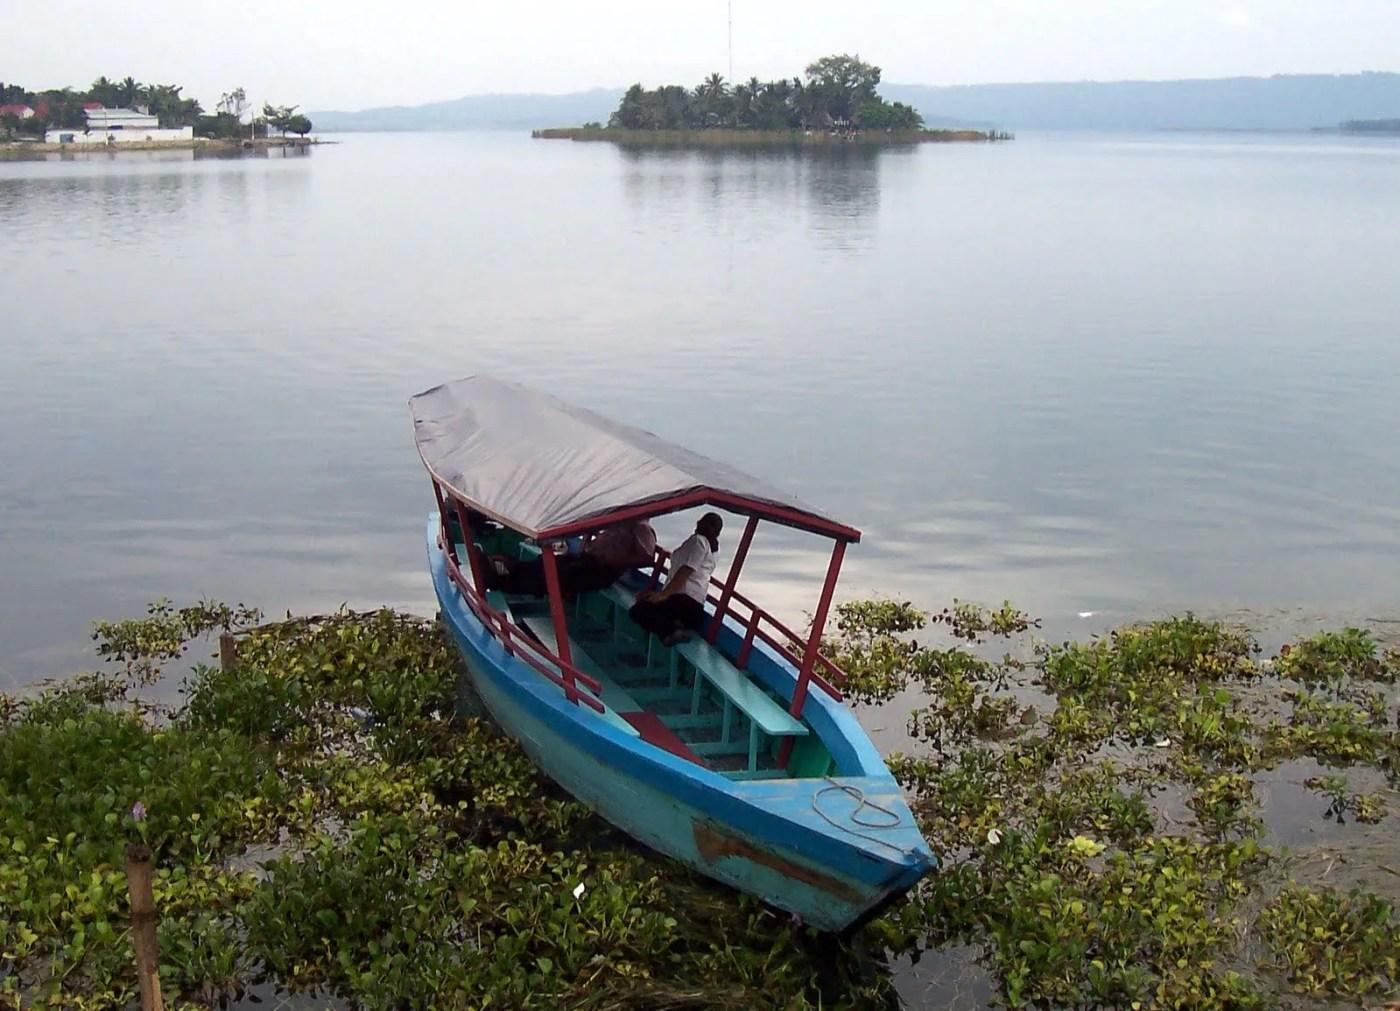 An image of a boat on Penten Itza Lake